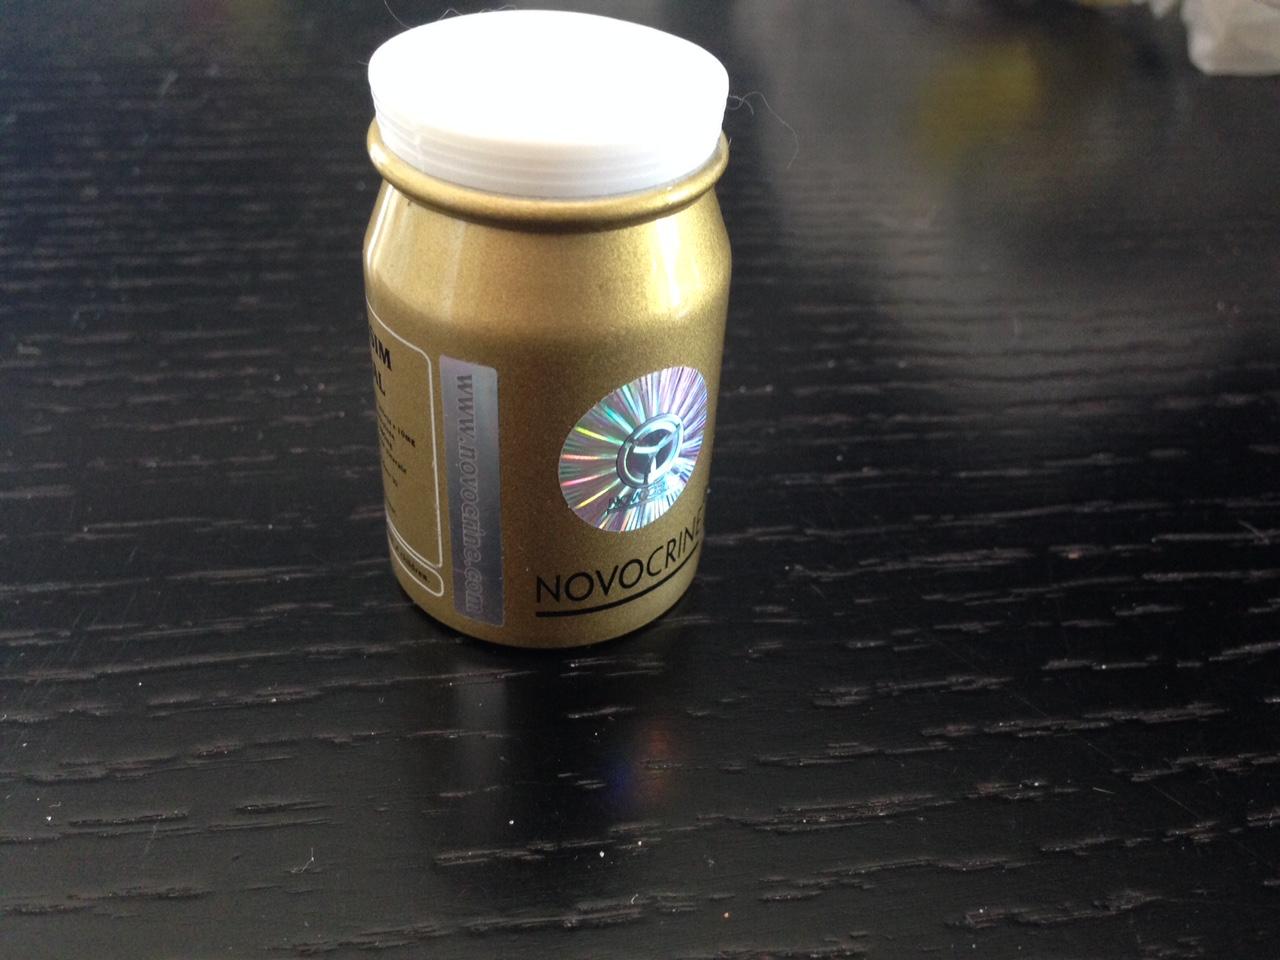 oxandrolone aka anavar